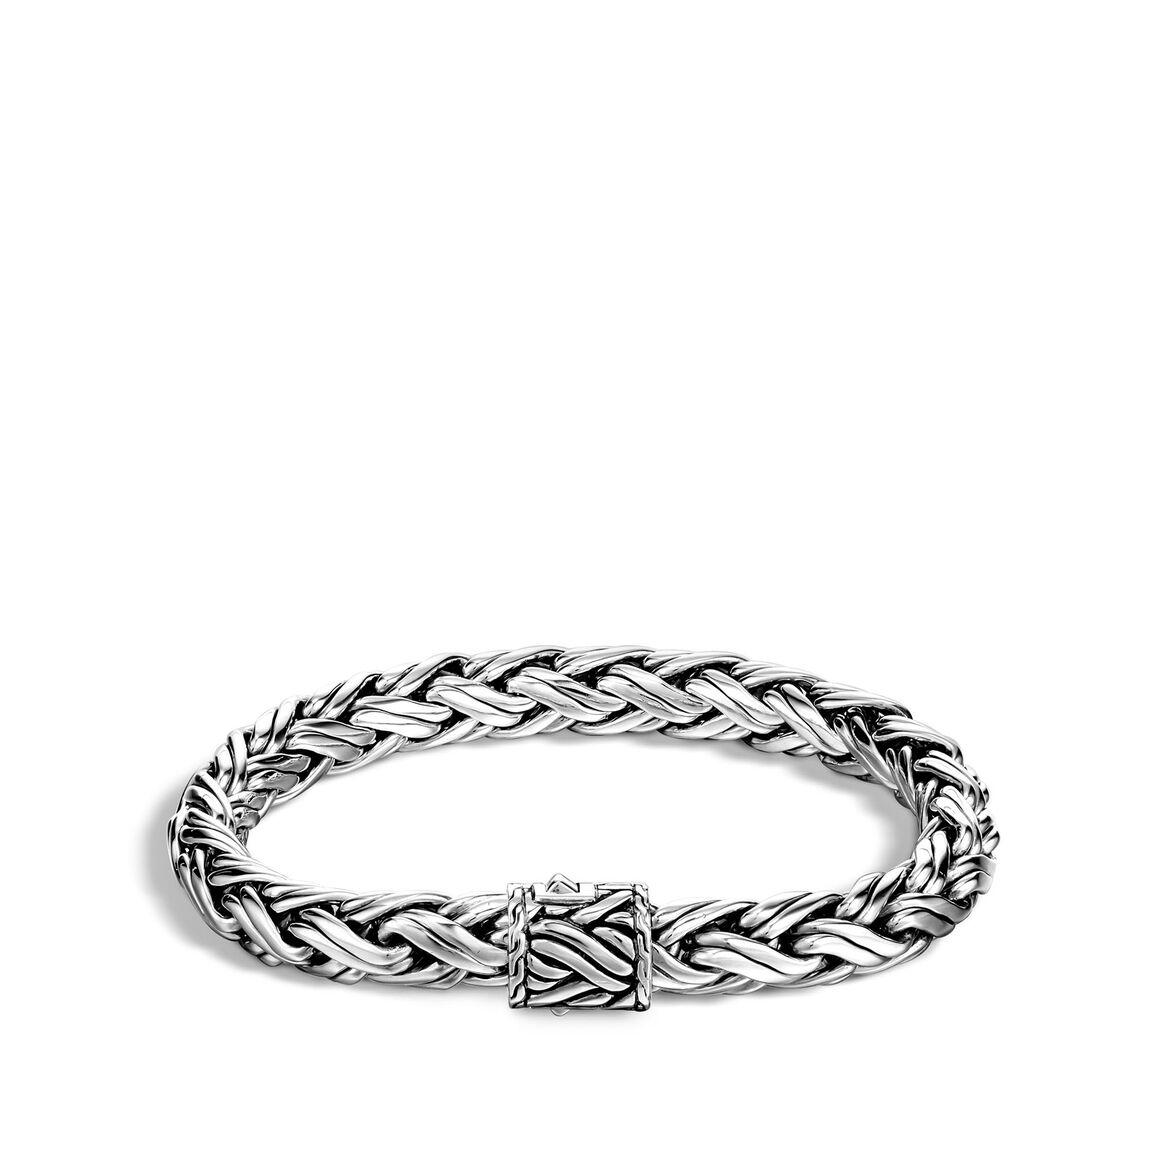 Classic Chain 7.5MM Woven Bracelet in Silver